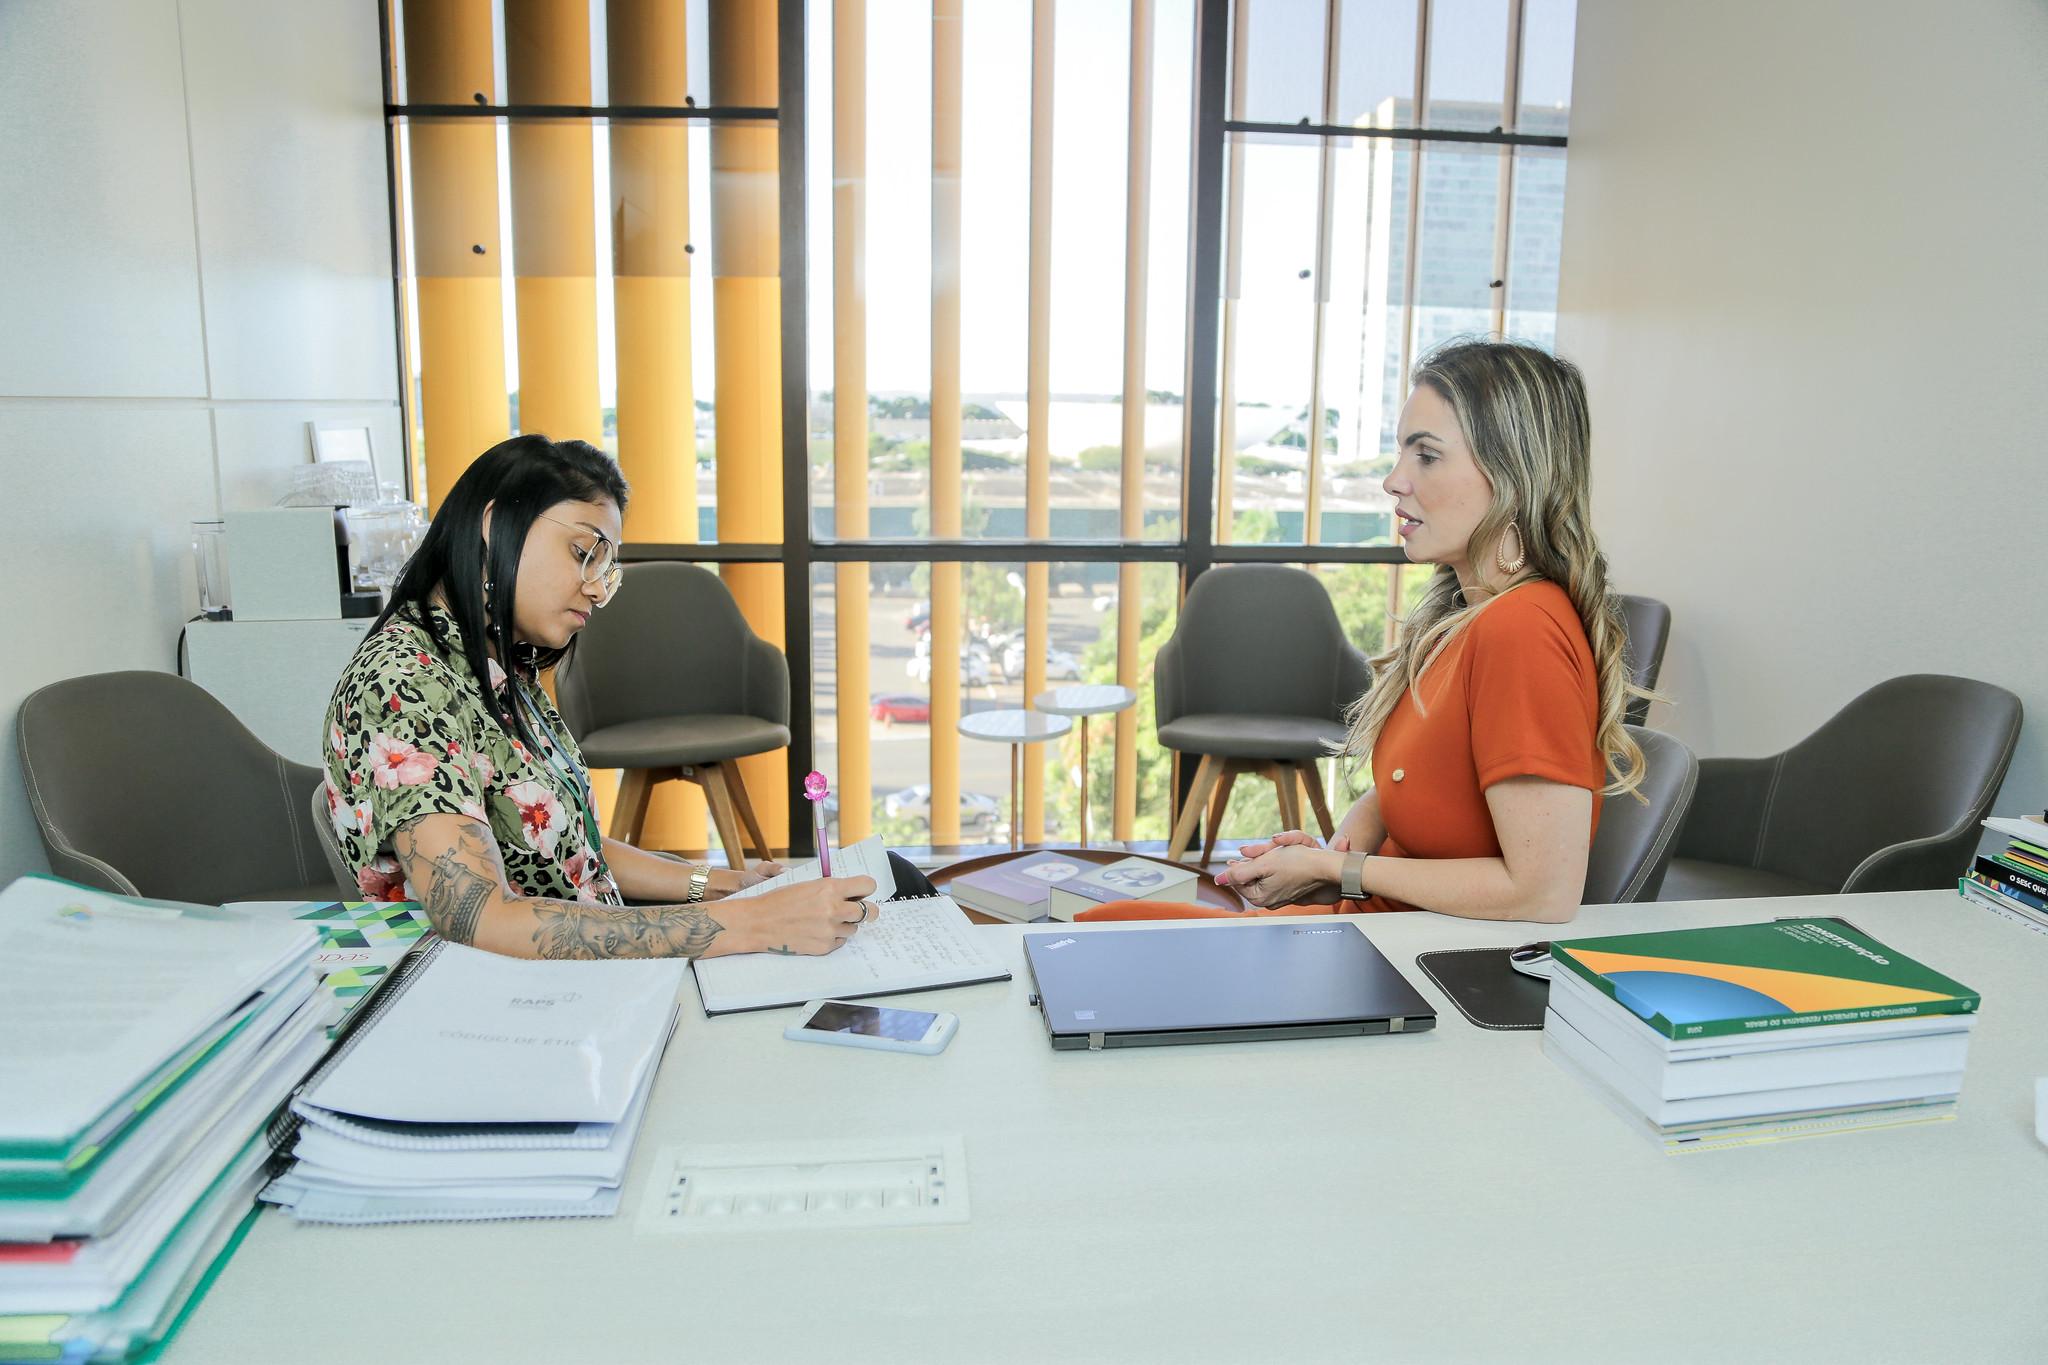 Empreendedora brasiliense produz vestido inspirado em Paula Belmonte